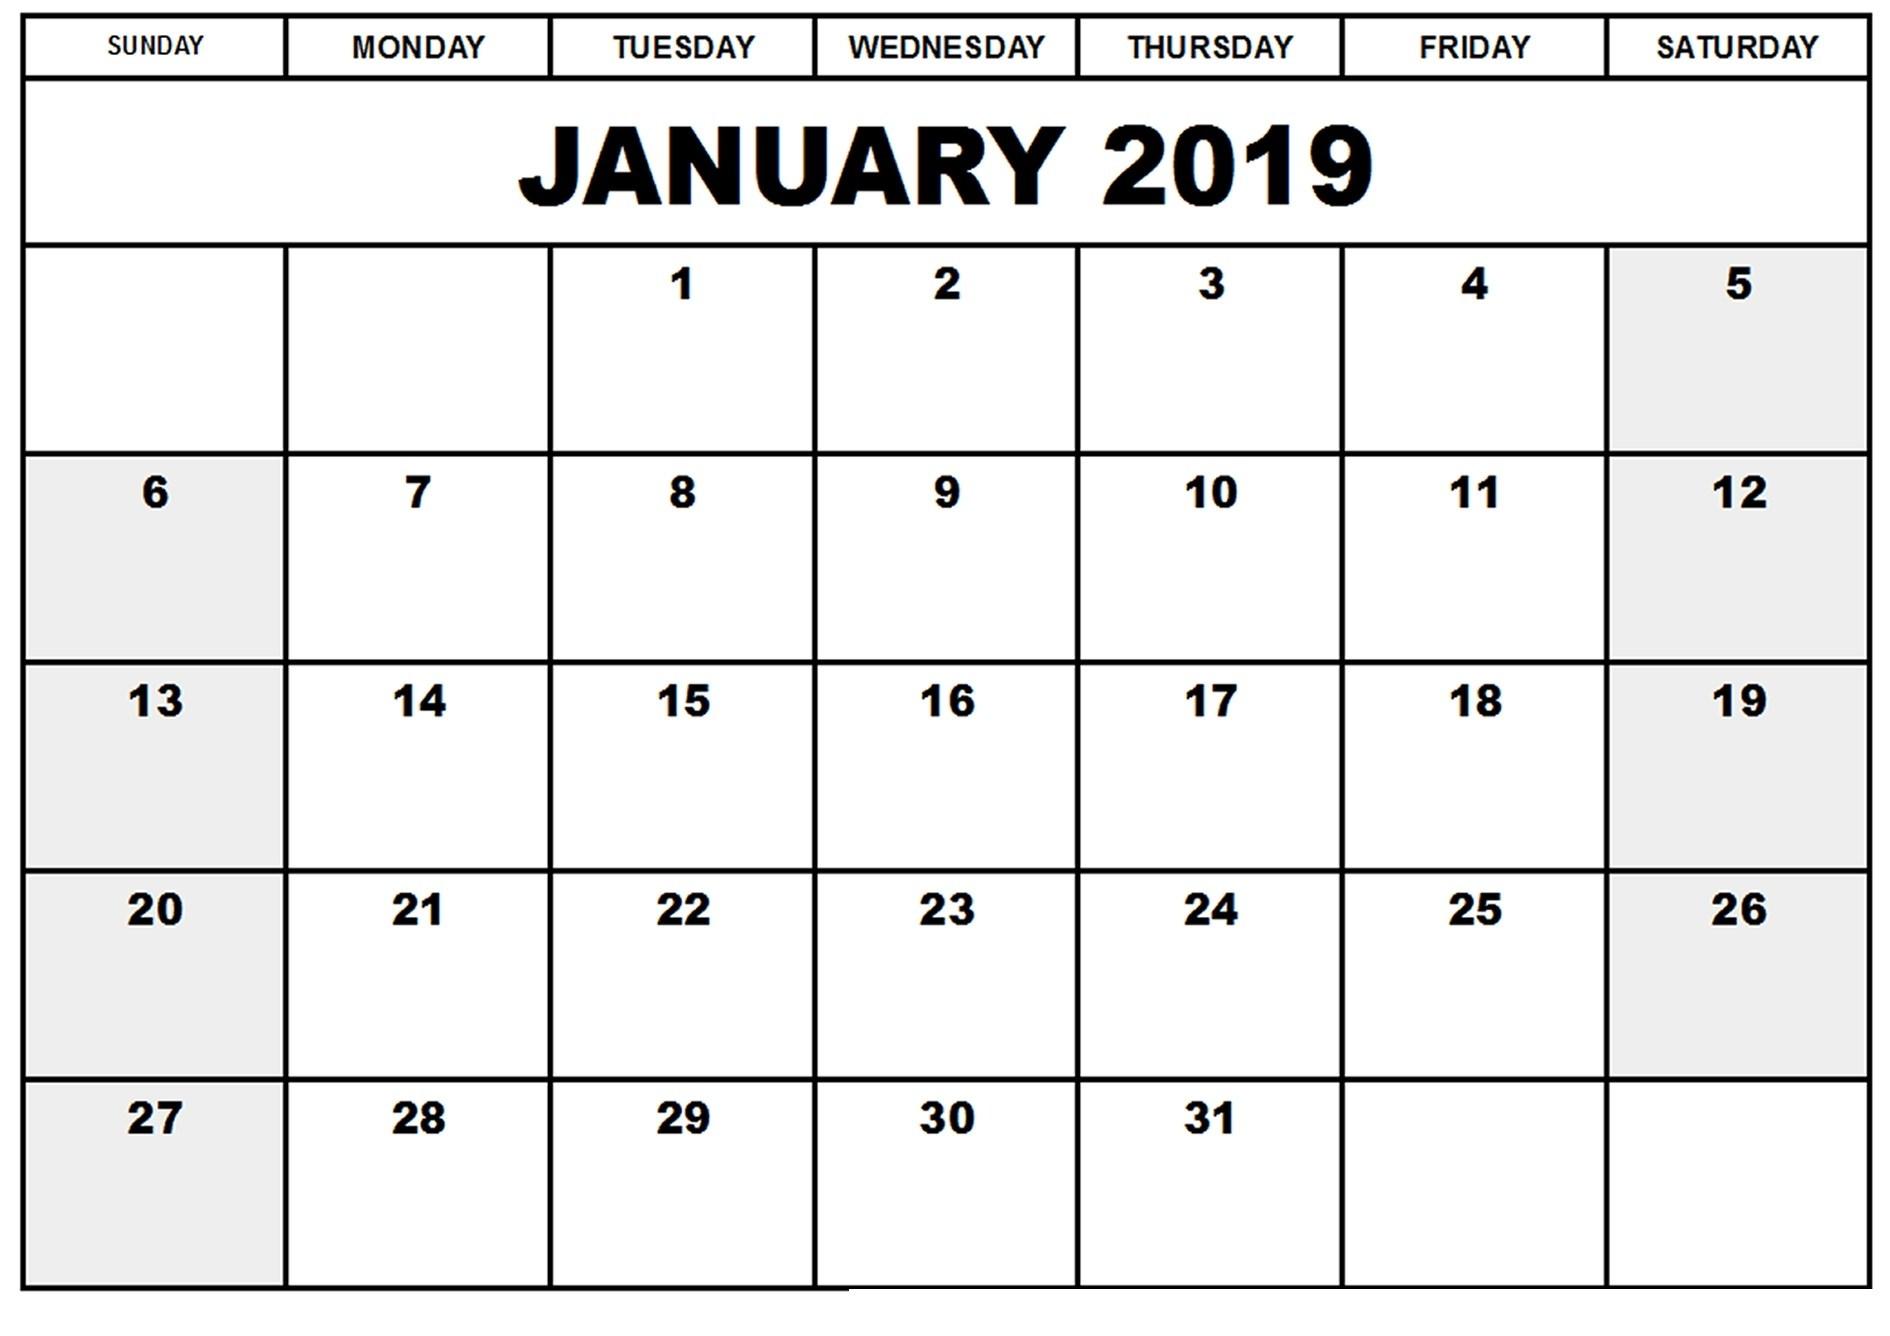 January 2019 South Africa Calendar